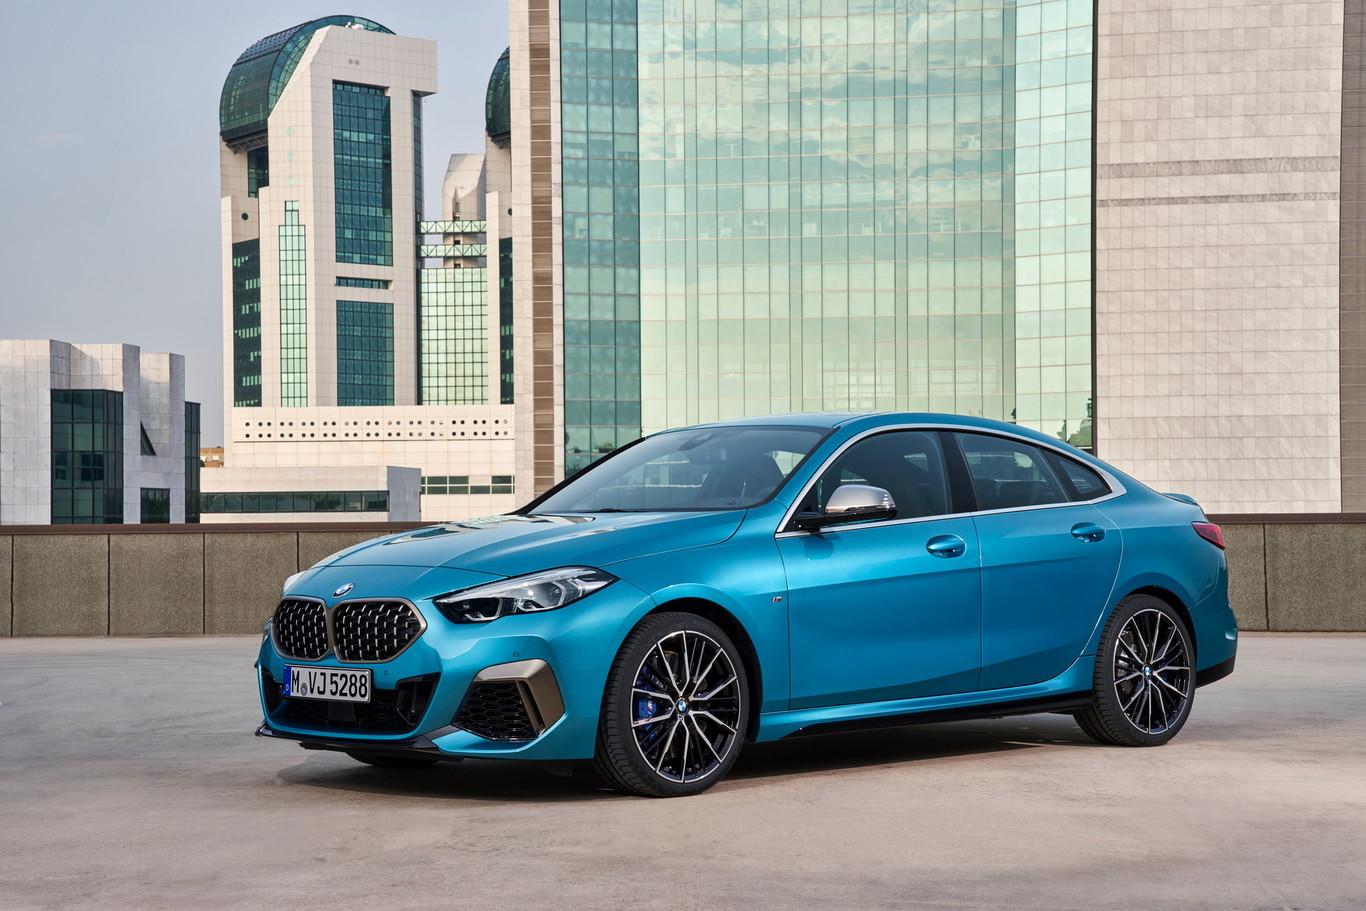 2021 BMW 220D Xdrive New Concept